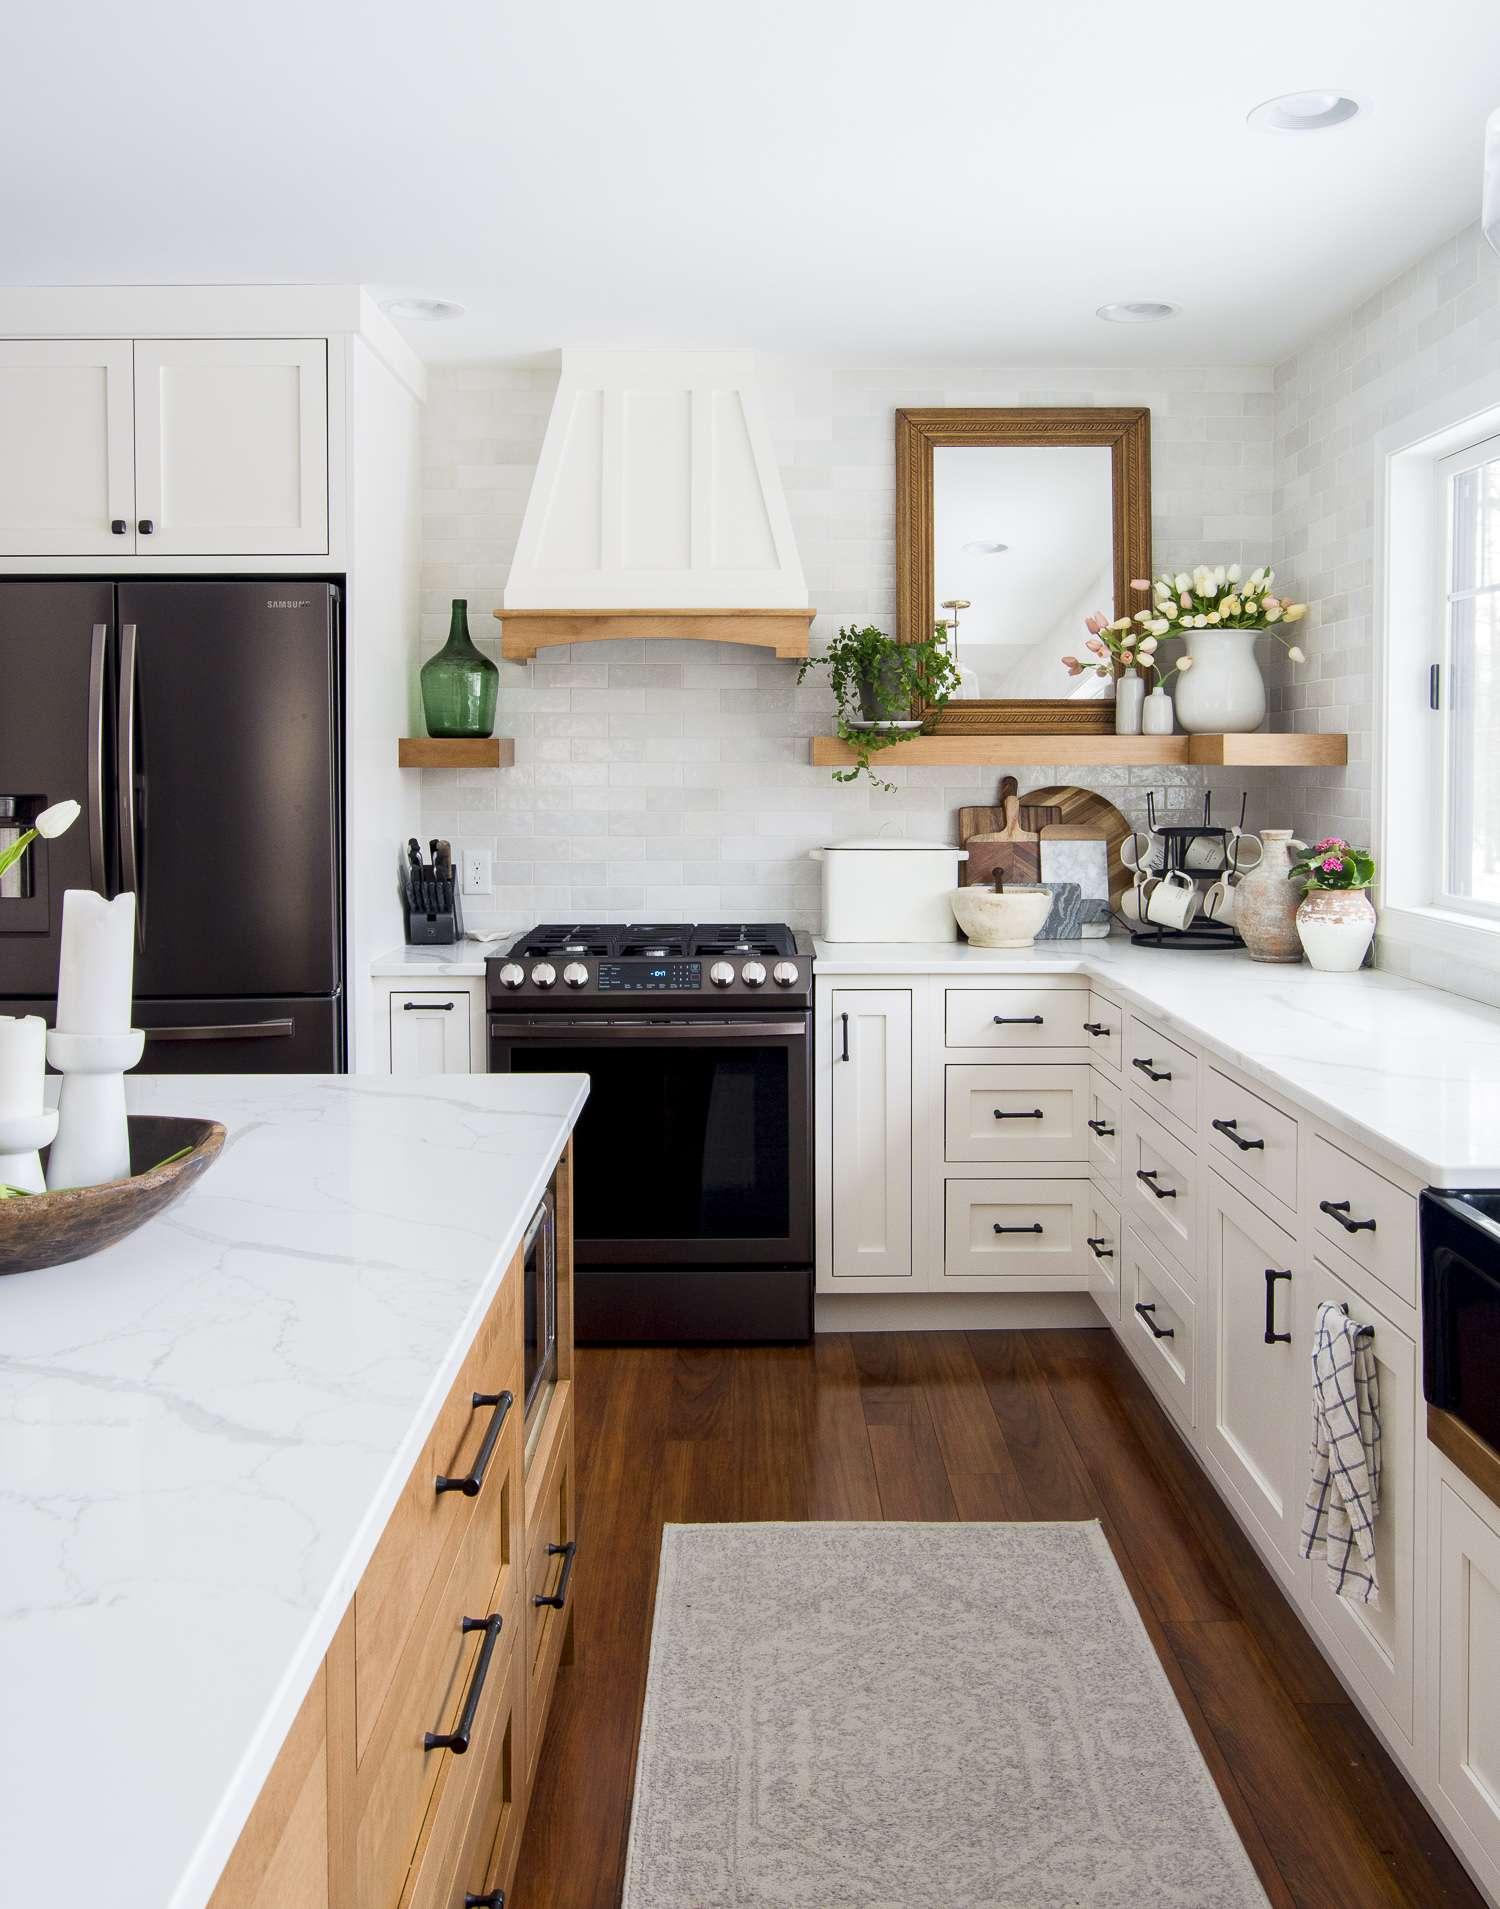 Kitchen decor ideas for spring.